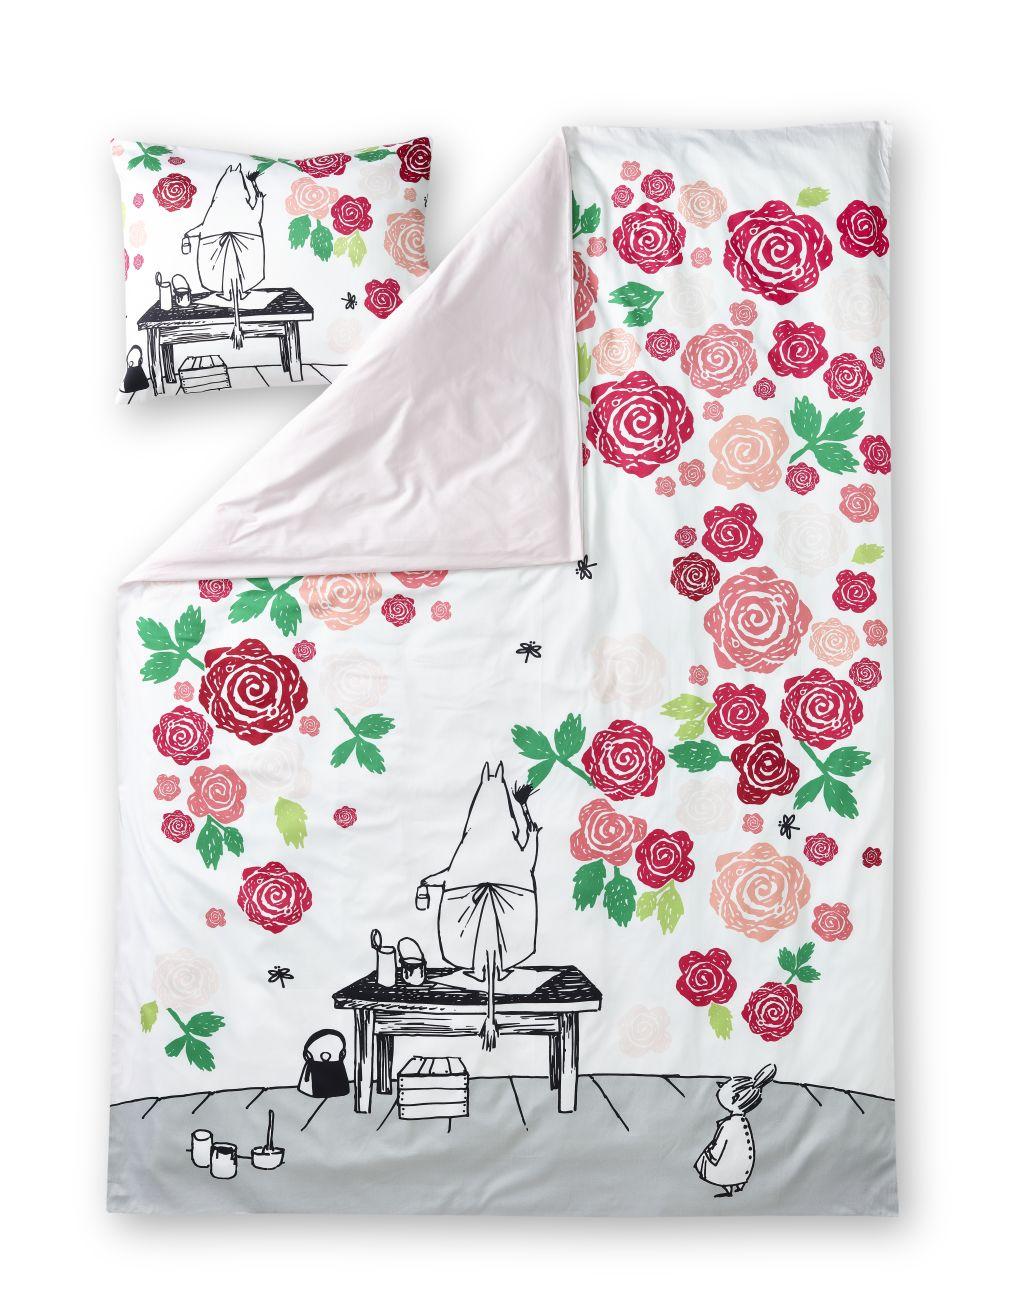 Finlayson Moominmamma rosegarden duvet cover set